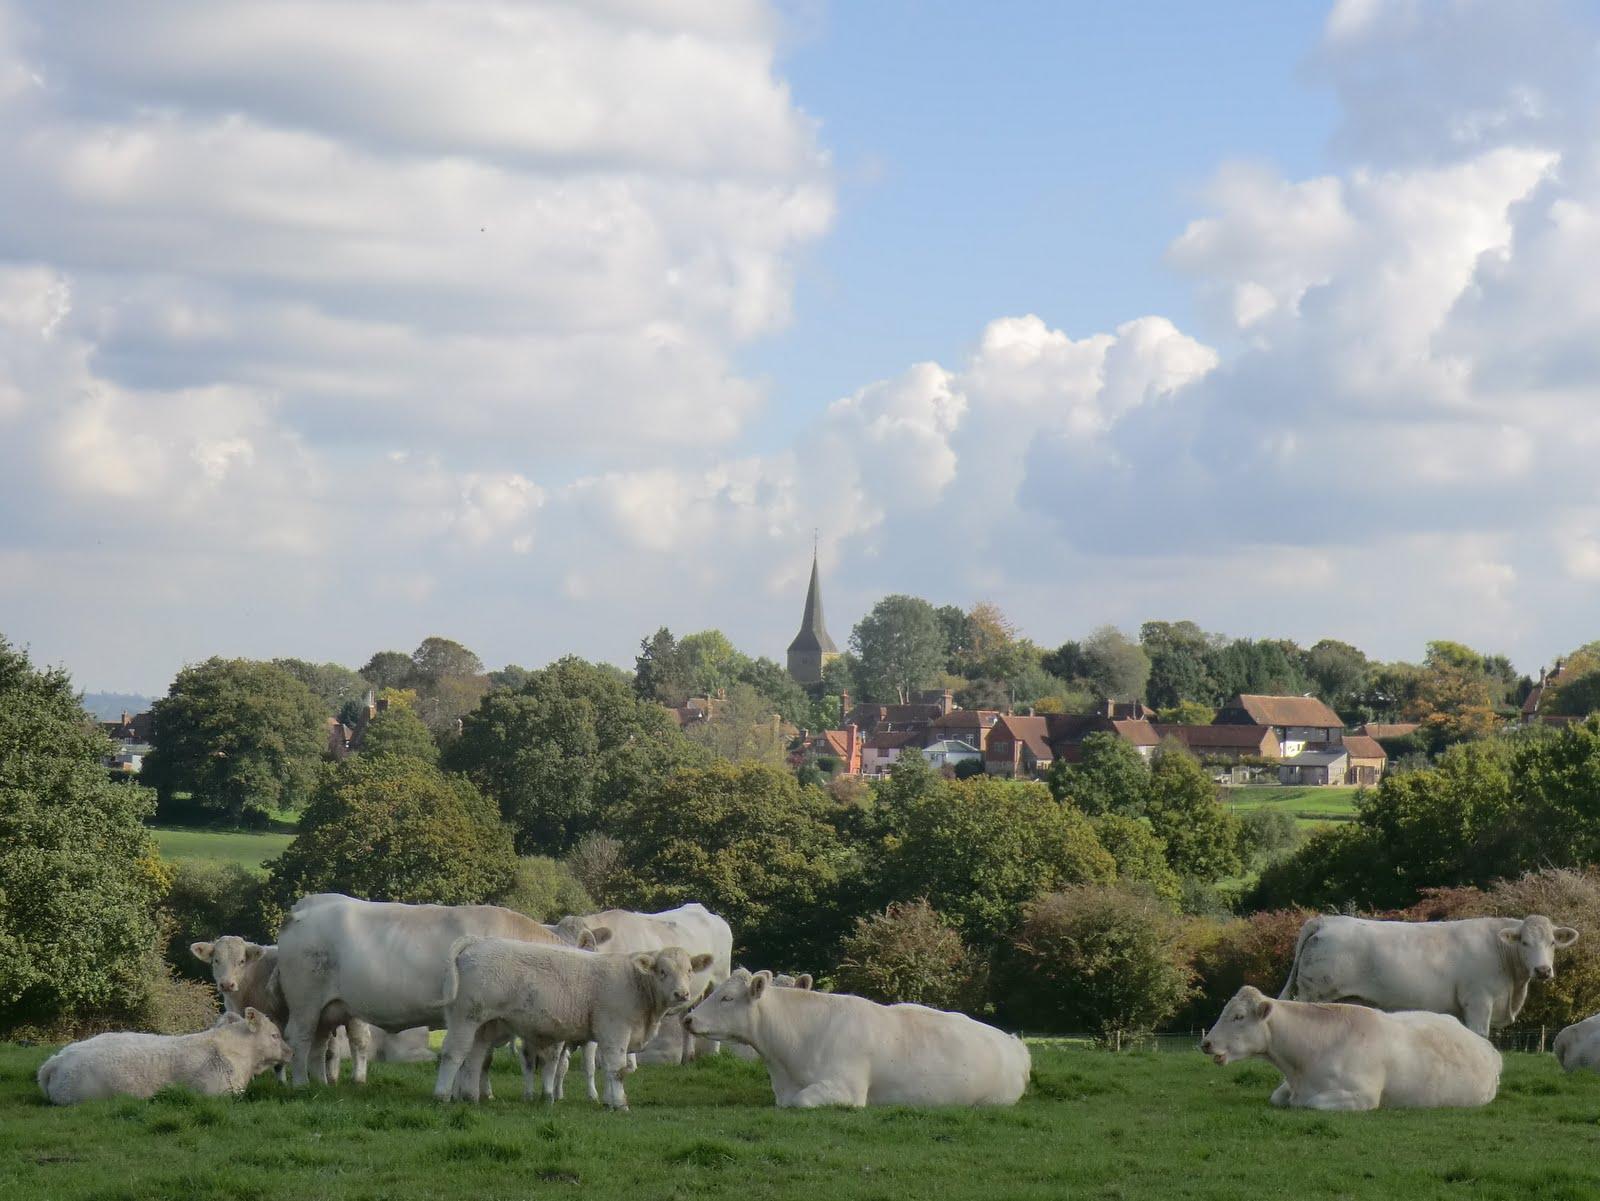 CIMG0704 View of Hartfield